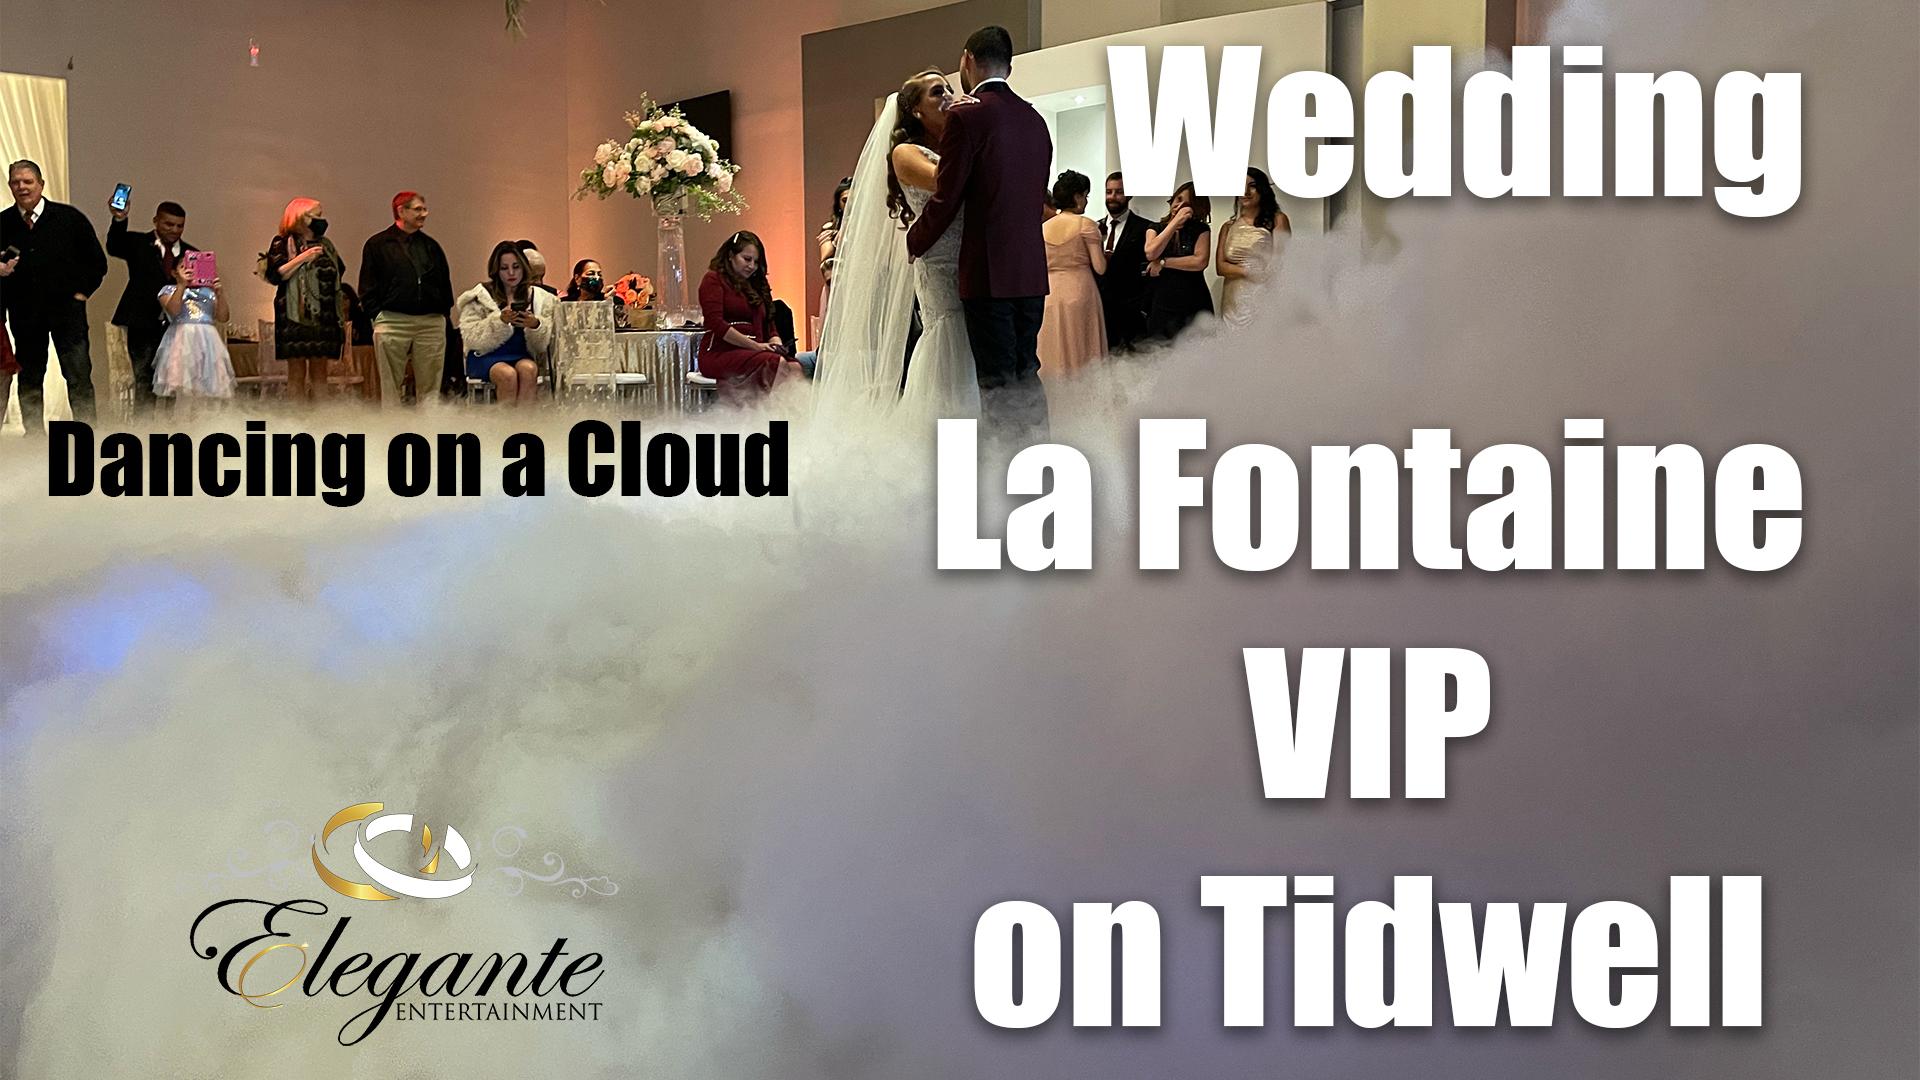 dancing on a cloud wedding